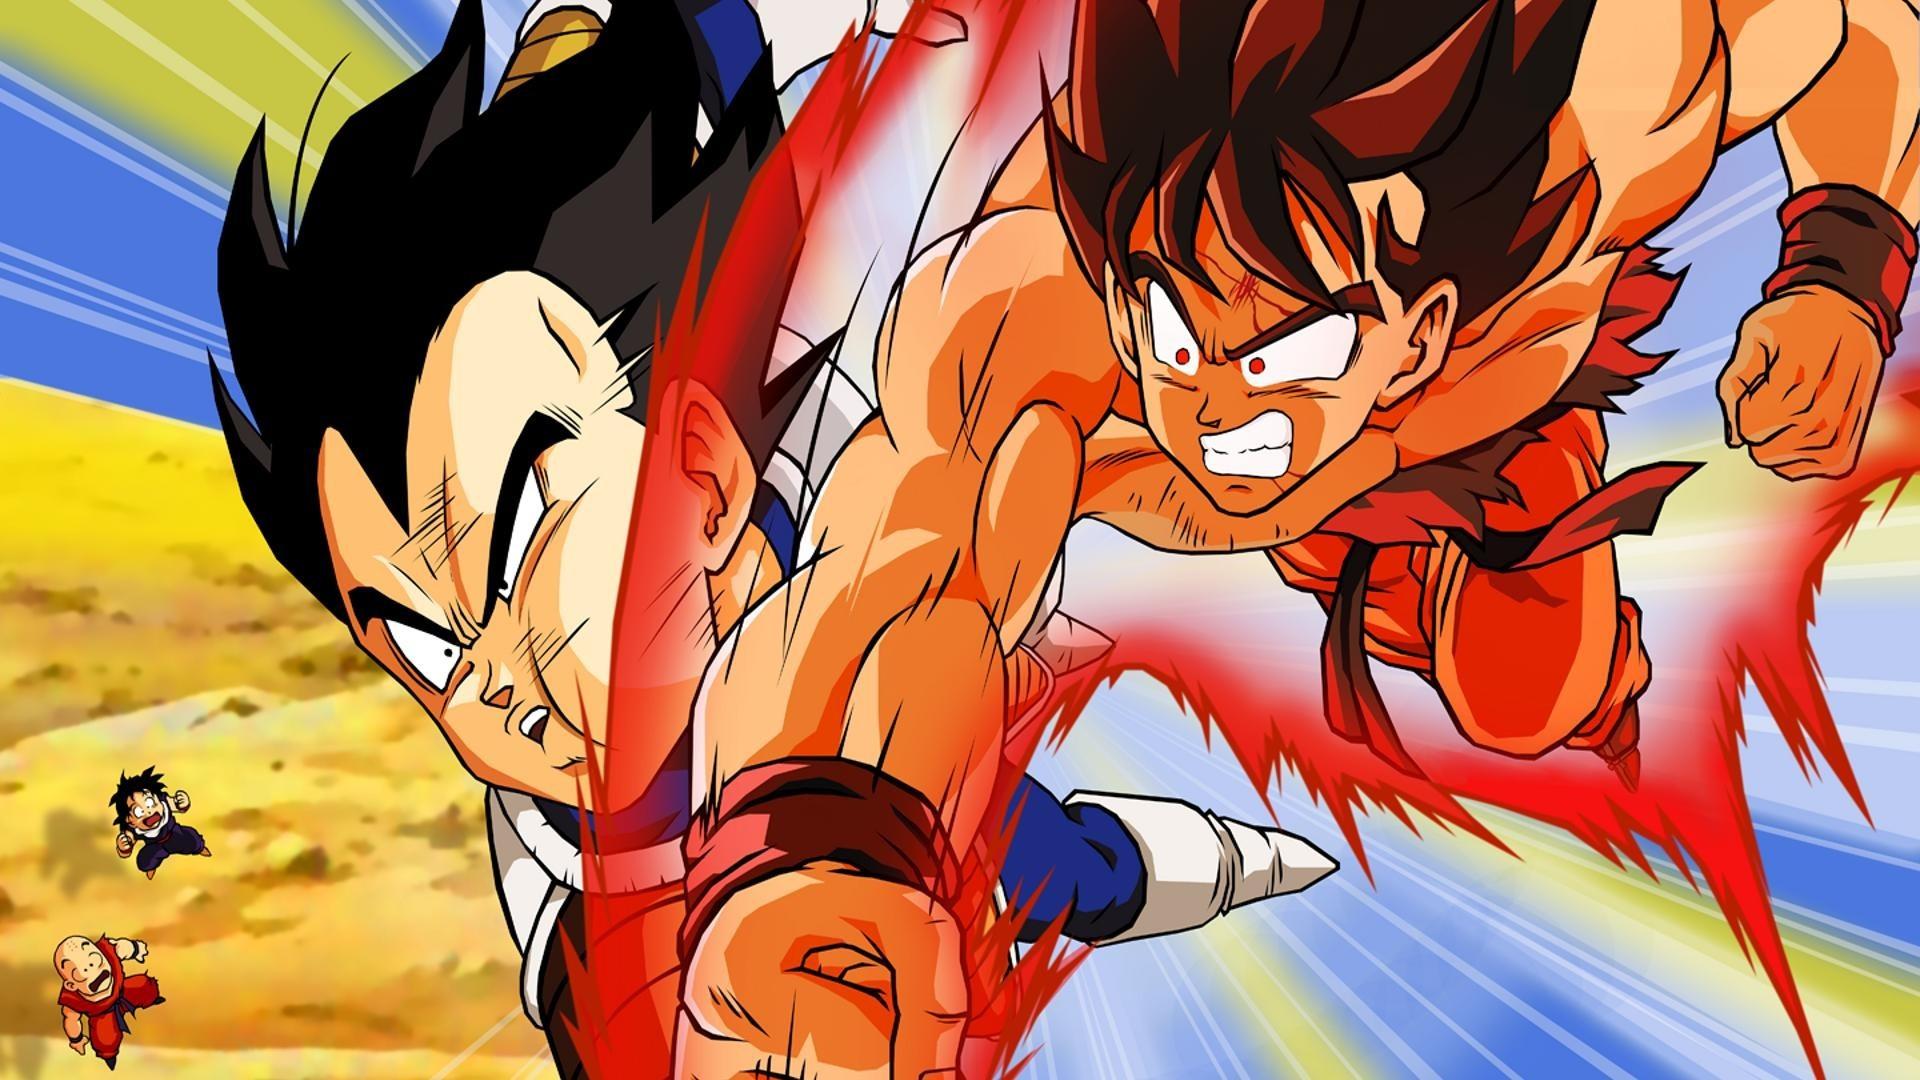 Dragon Ball Z Goku VS Vegeta Fighting wallpapers and Goku VS Vegeta  Fighting backgrounds for your computer desktop. Find Goku VS Vegeta  Fighting pictures …